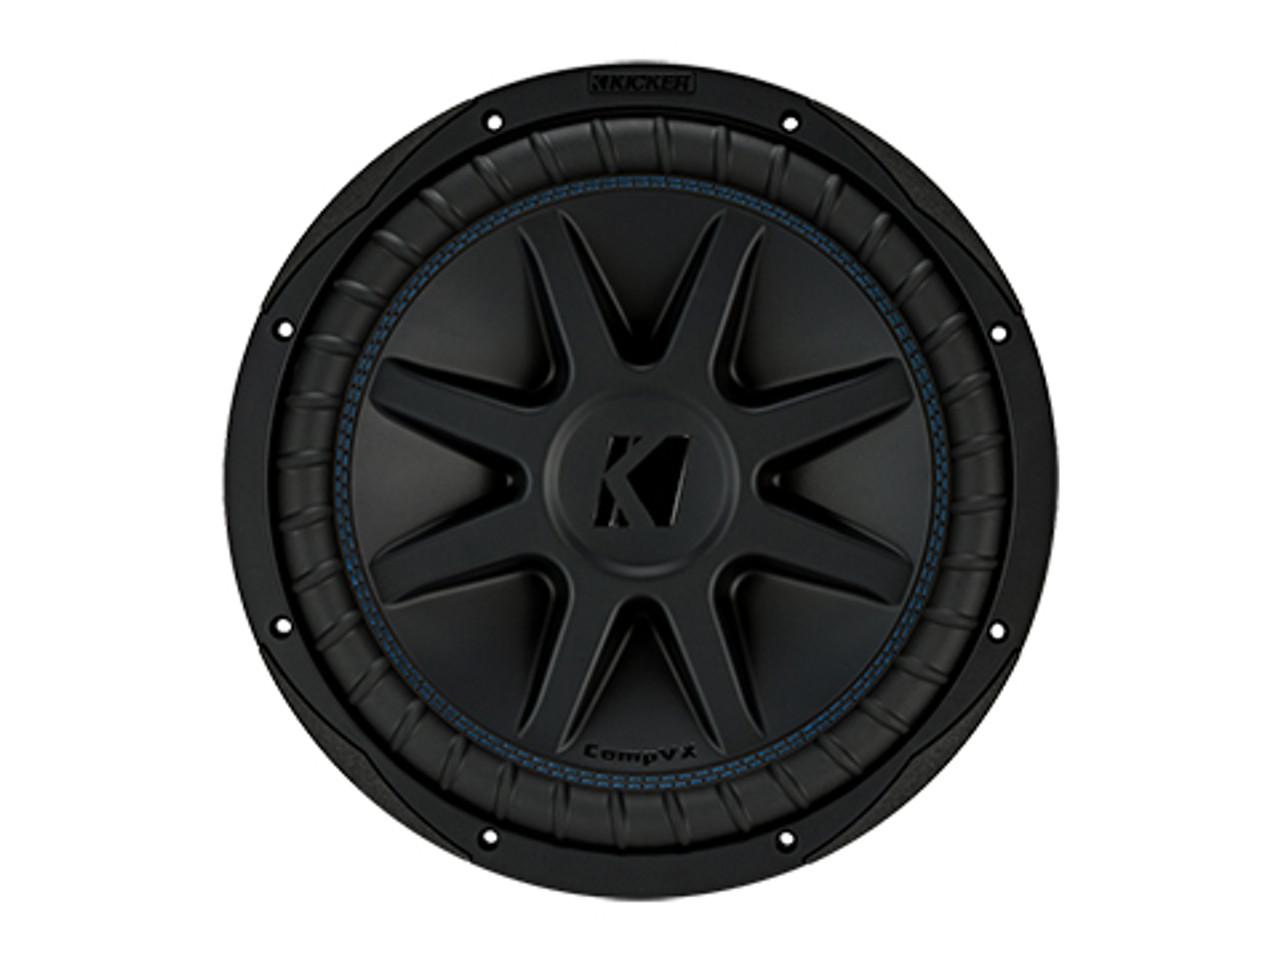 7bd9c55be85952 Kicker Comp VX 12 inch Car Audio Subwoofer Dual 4 Ohm Sub - 44CVX124